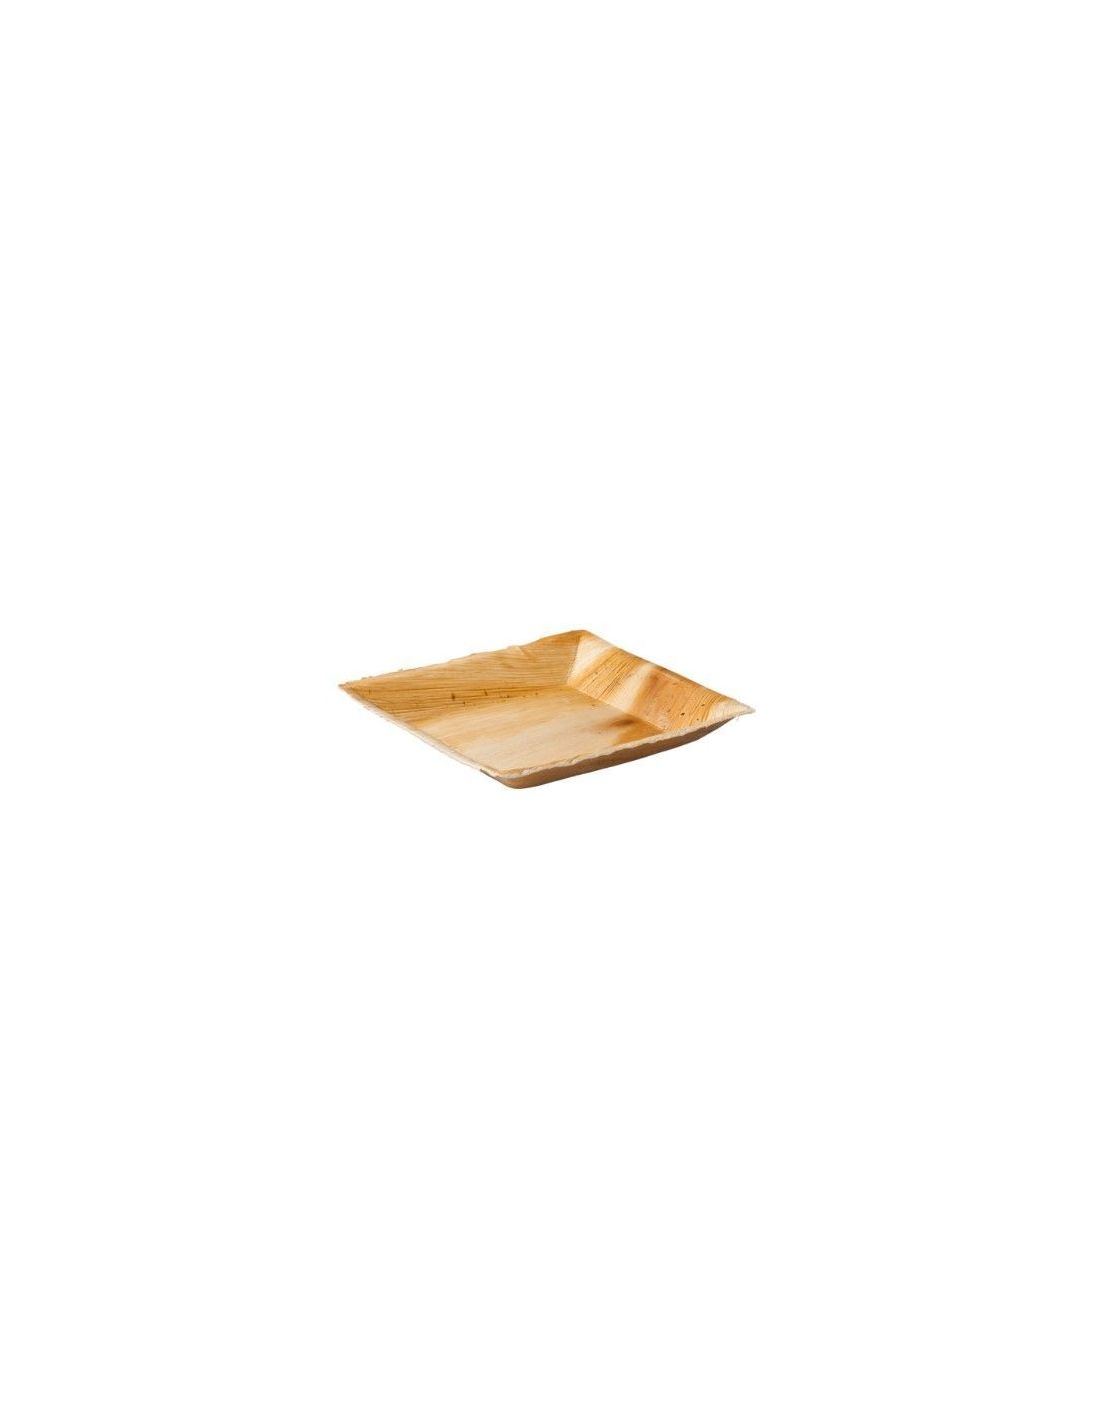 Palmilehest kandiline taldrik 18 x 18 cm